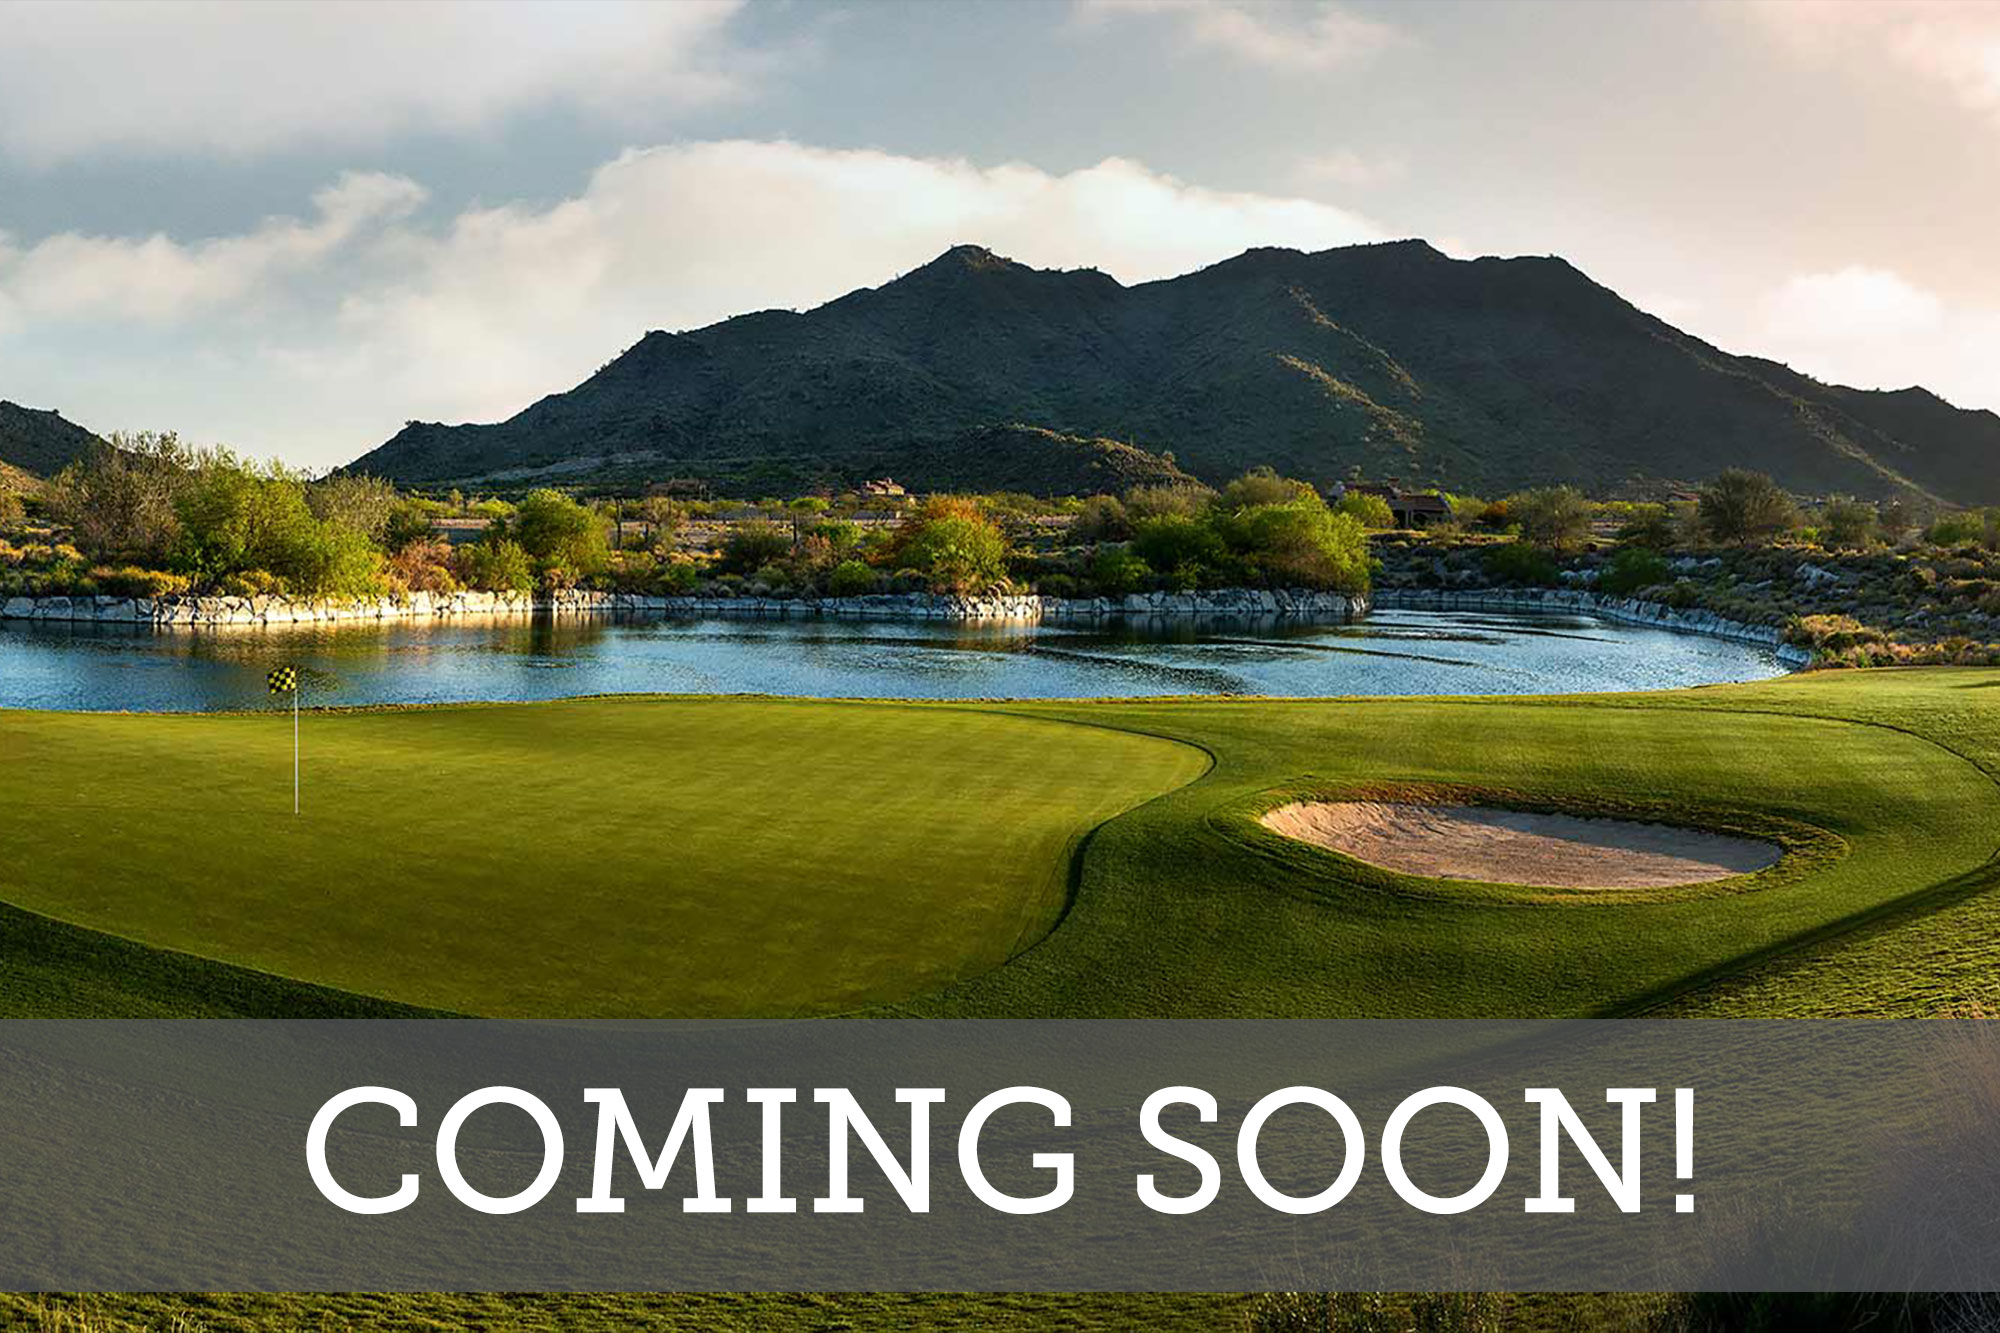 Verrado Highlands - Signature Series - Coming Soon